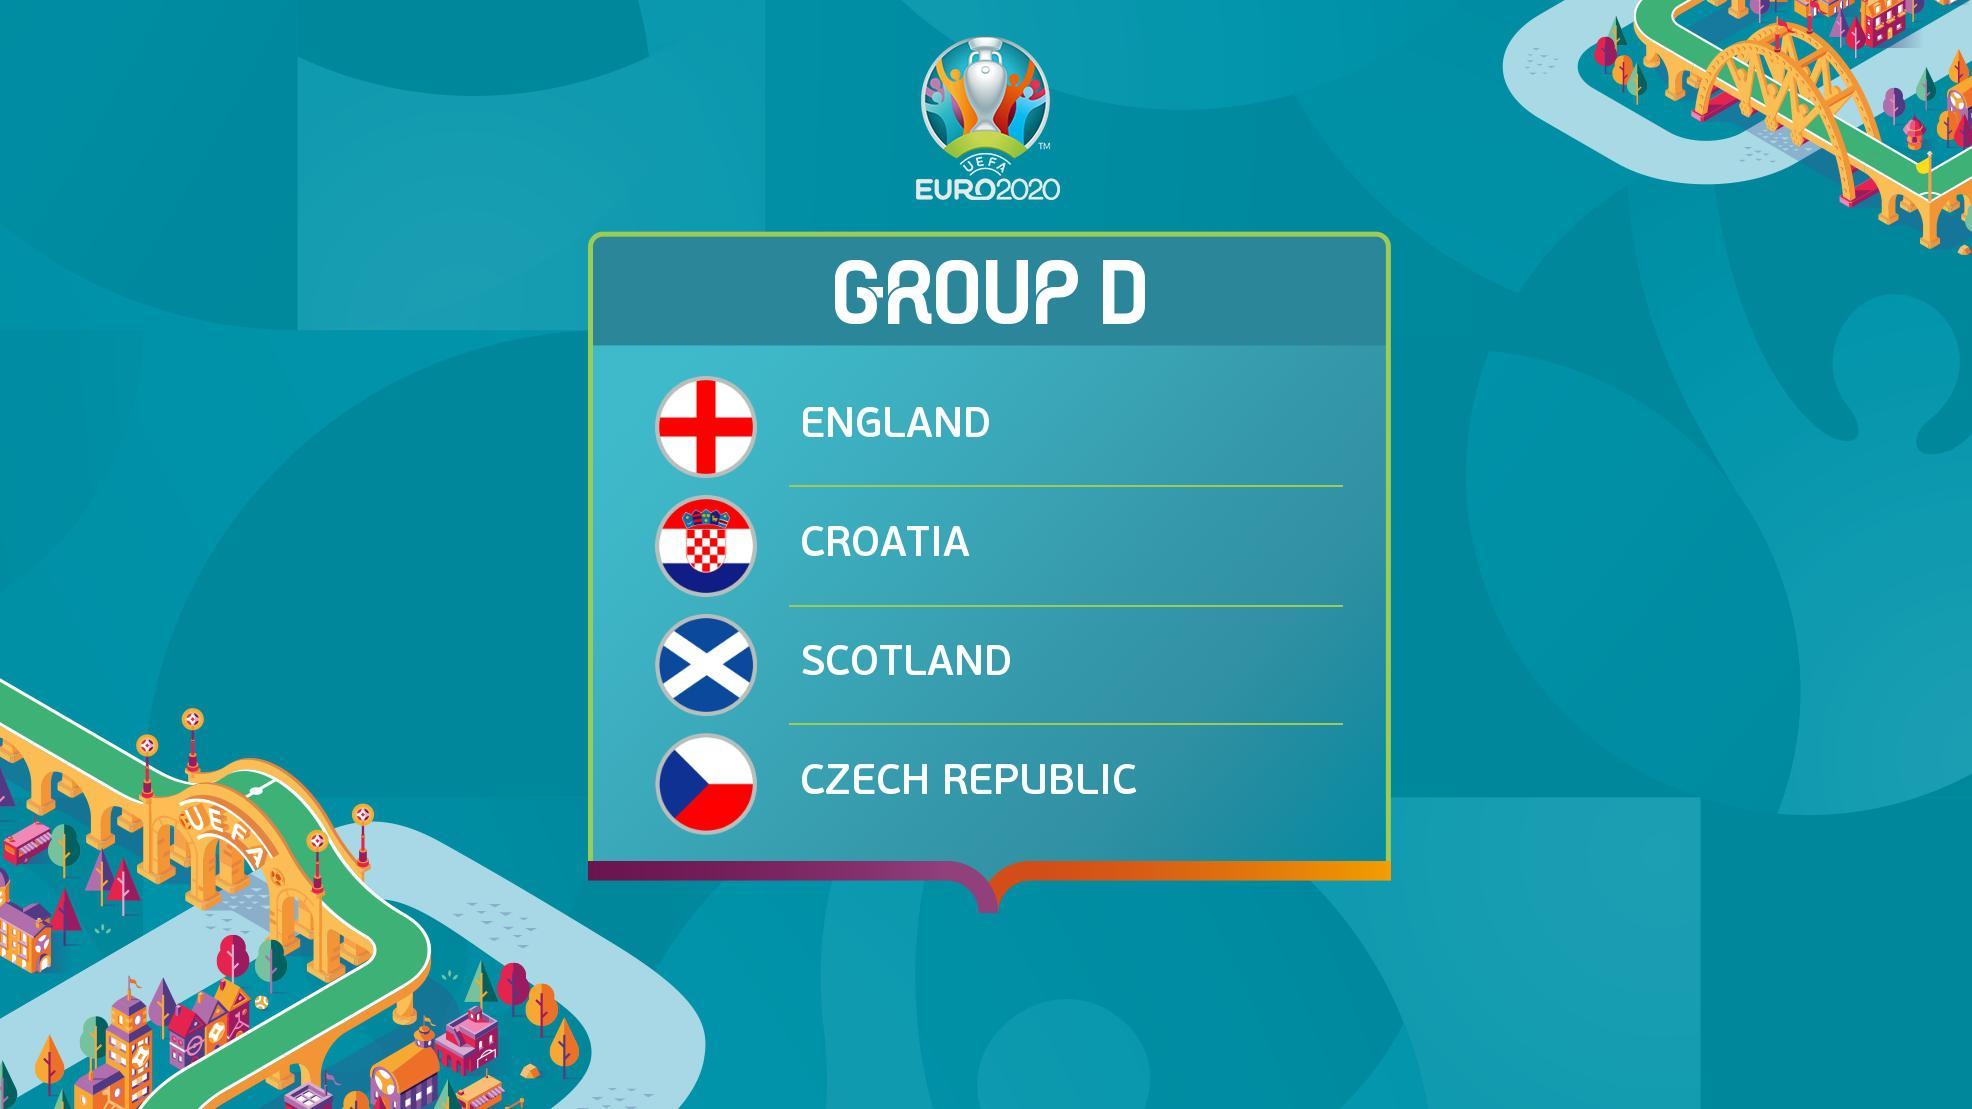 UEFA EURO 2020 Group D: England, Croatia, Scotland, Czech Republic | UEFA  EURO 2020 | UEFA.com